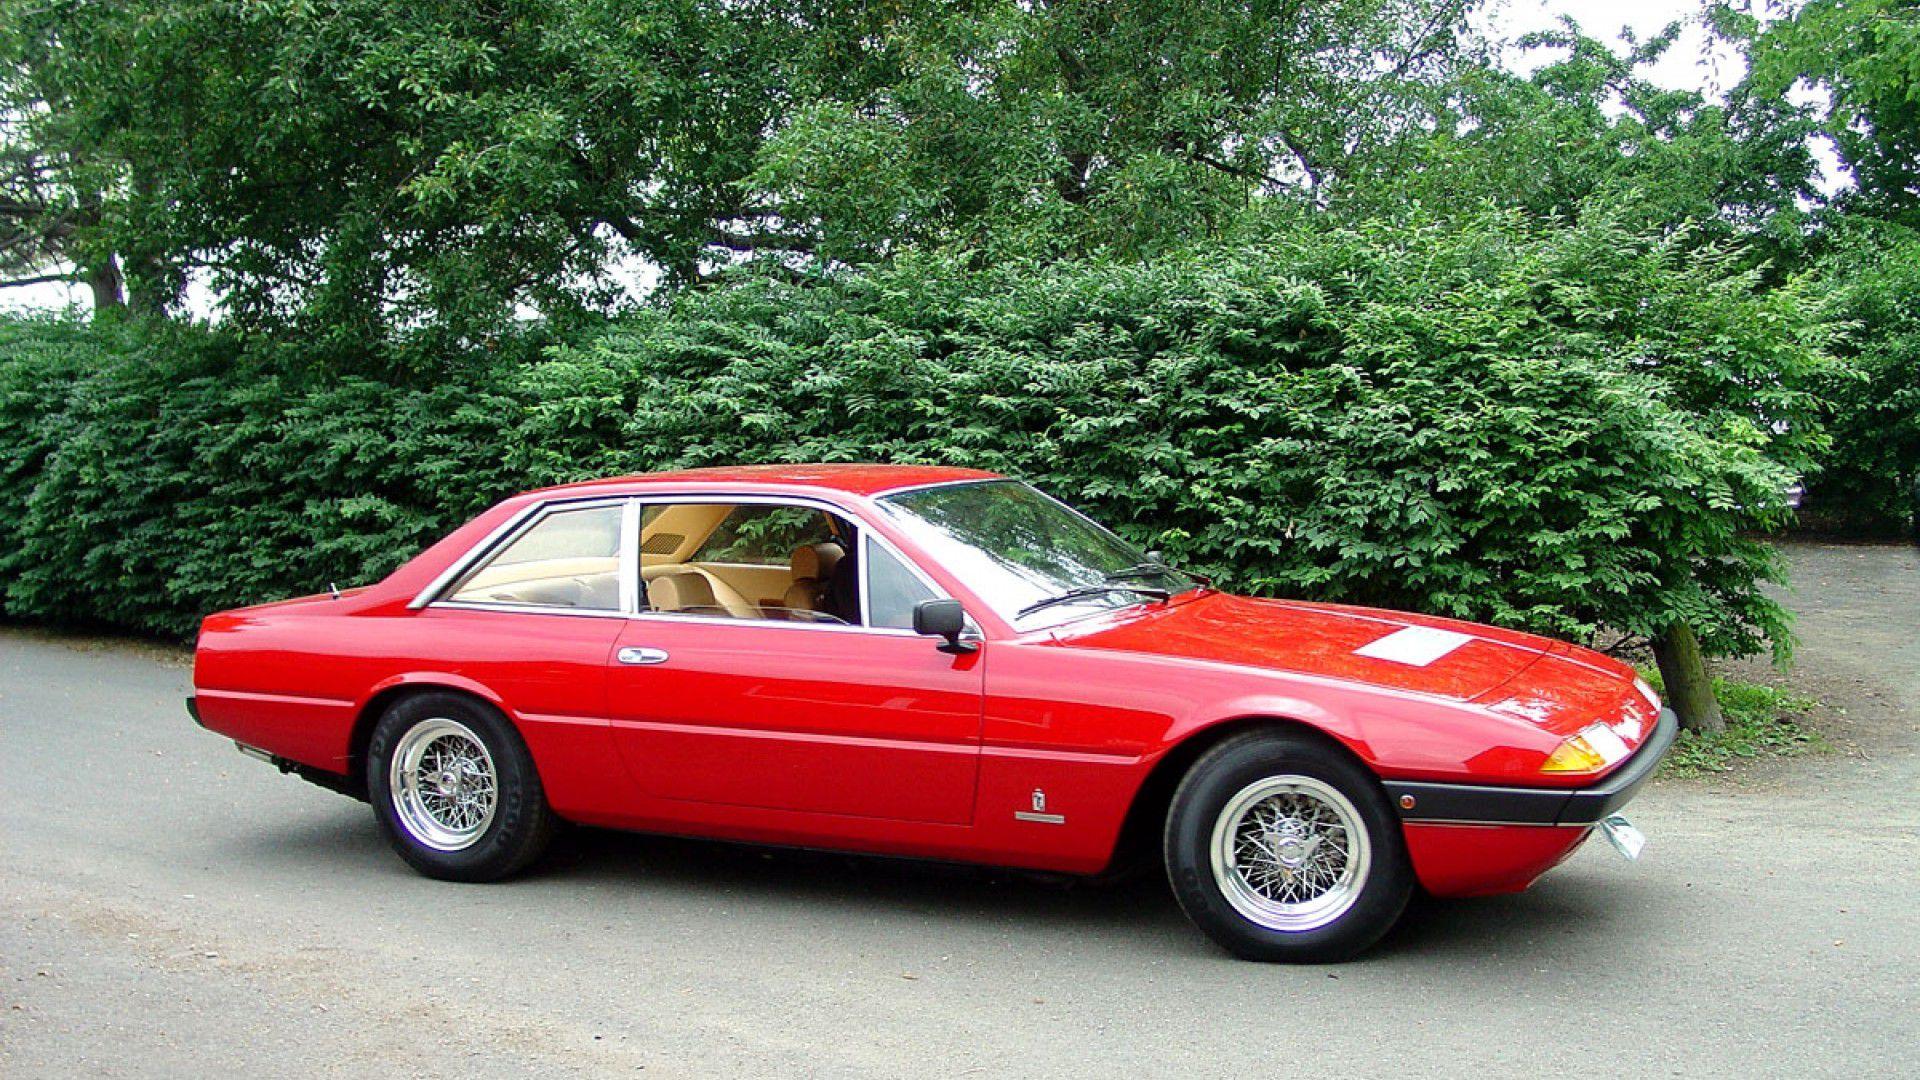 Ferrari 400i 187 Definitive List Cars